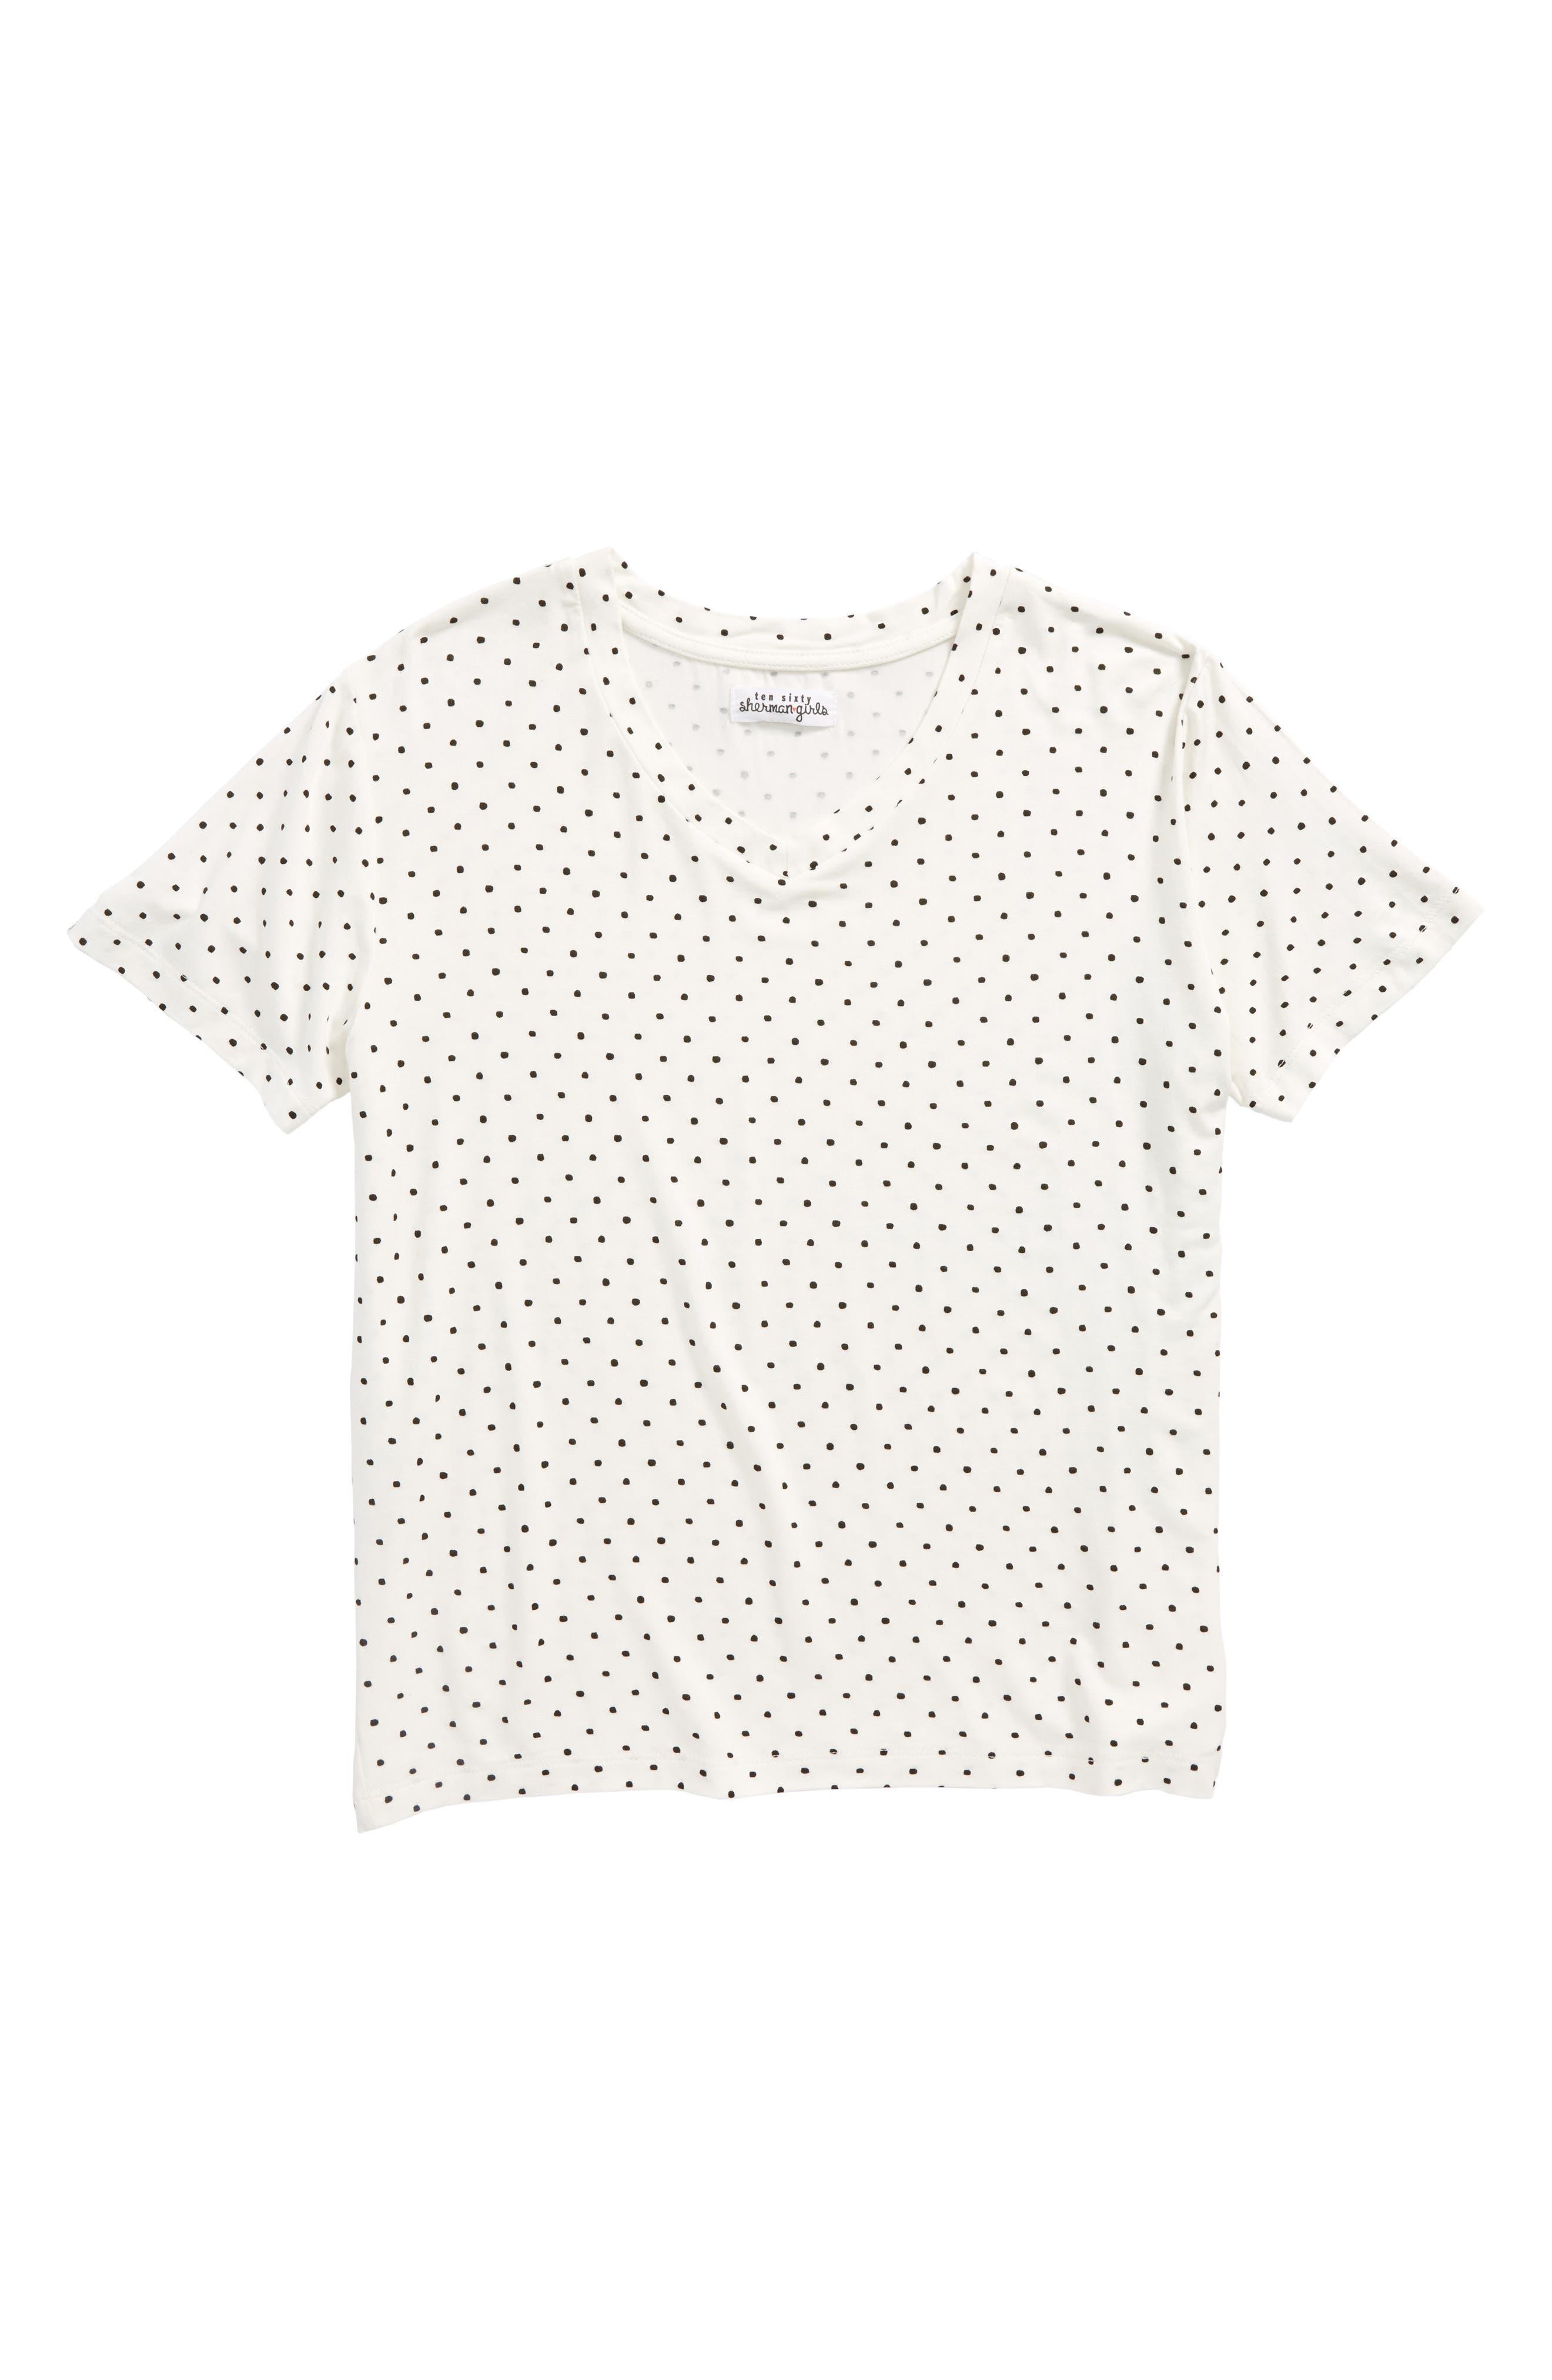 Polka Dot Tee,                         Main,                         color, White/ Black